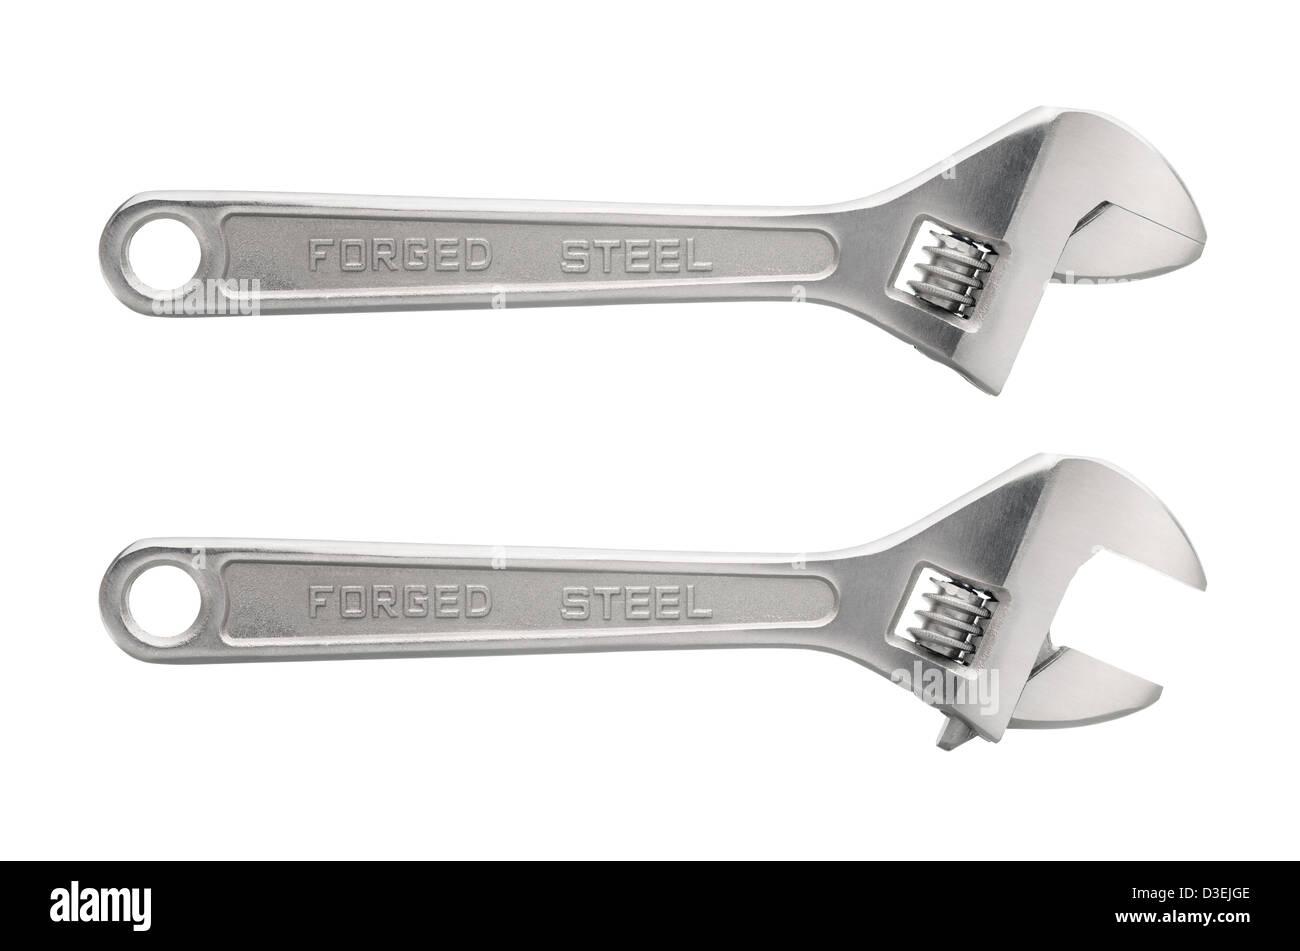 Tools: adjustable wrench, isolated on white background - Stock Image